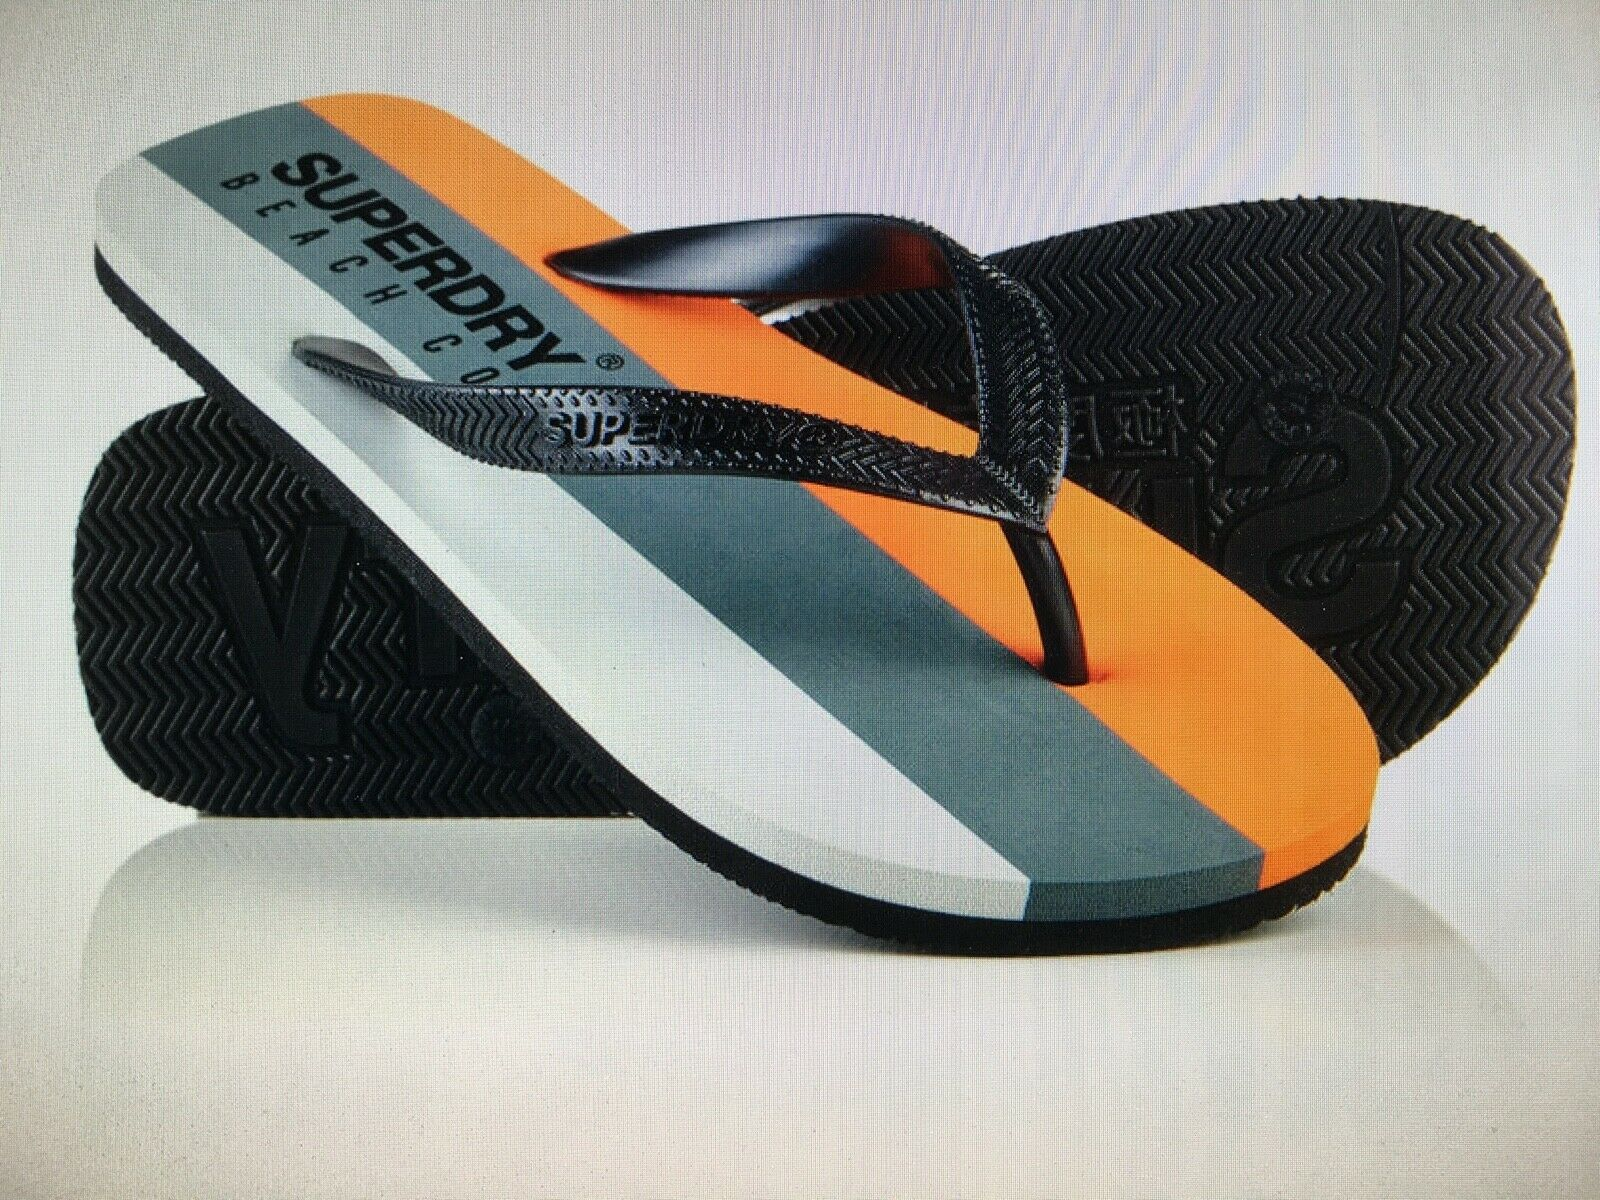 NEW Superdry Sleek Flip-Flops UK Small